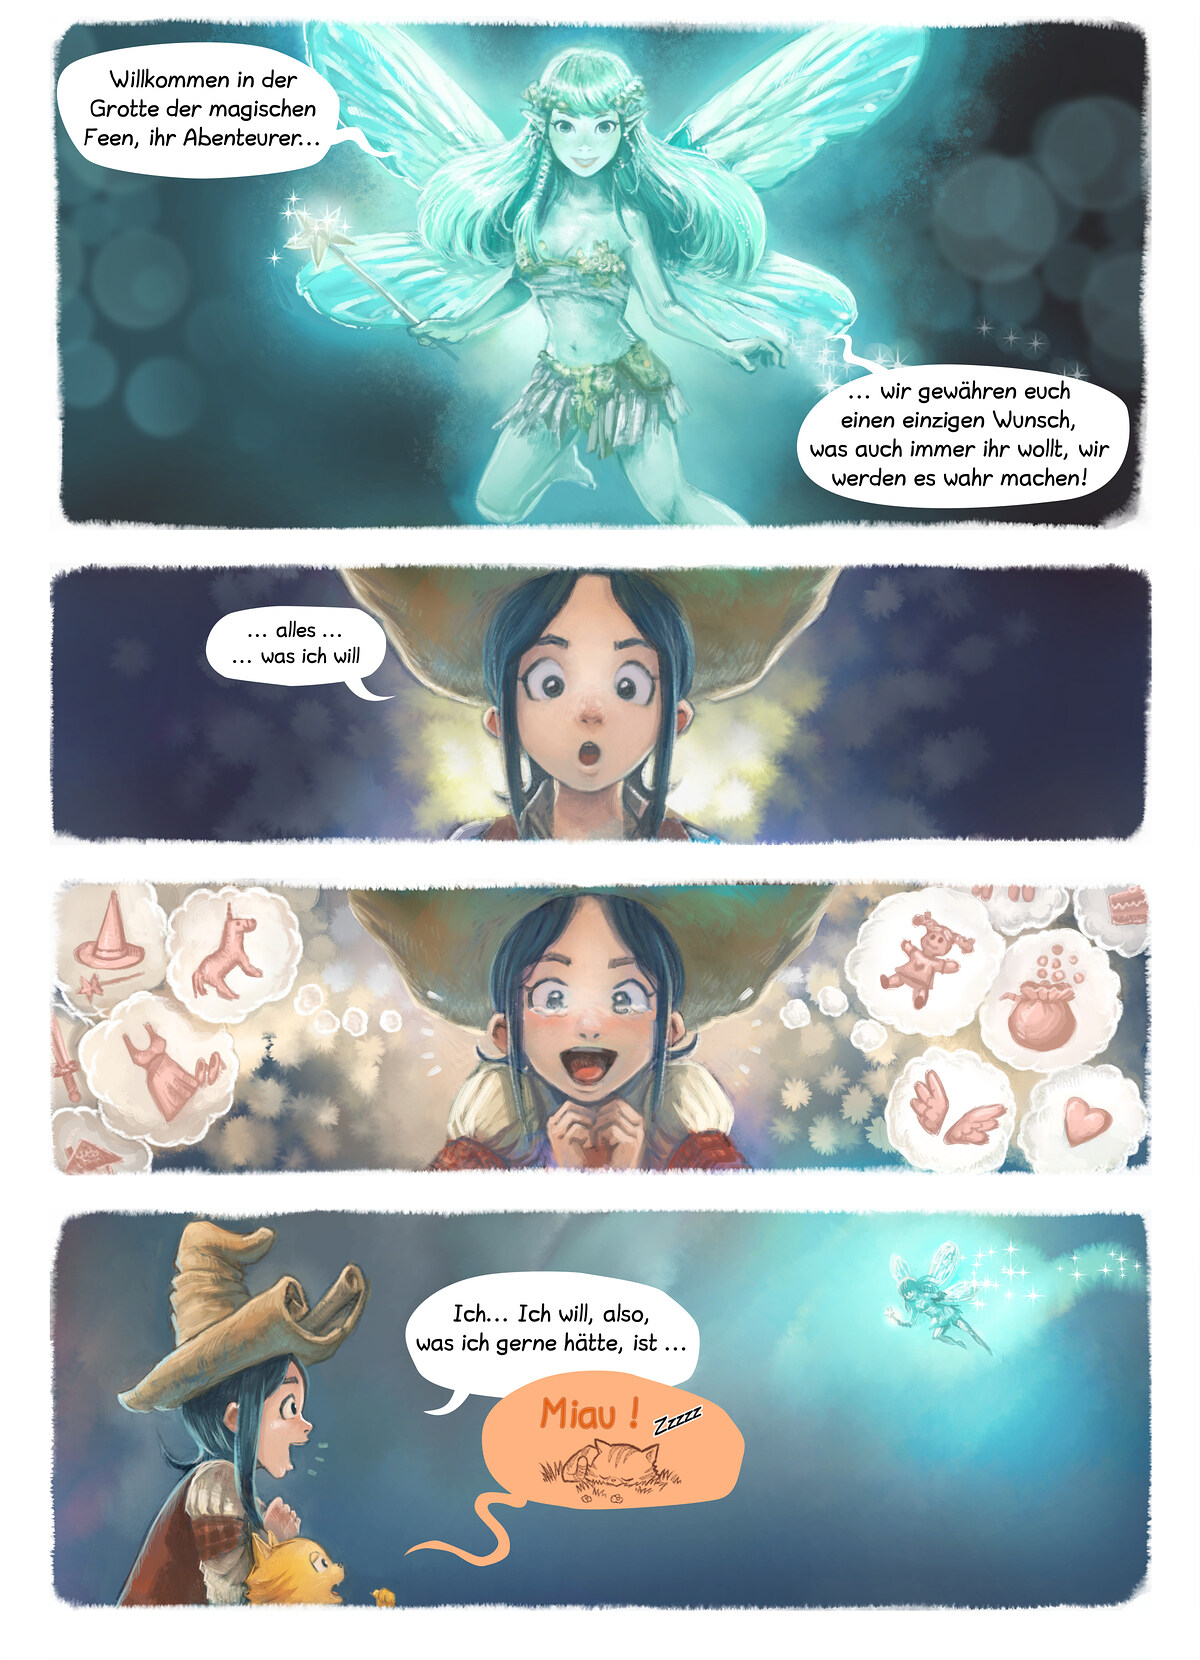 A webcomic page of Pepper&Carrot, Episode 7 [de], Seite 4